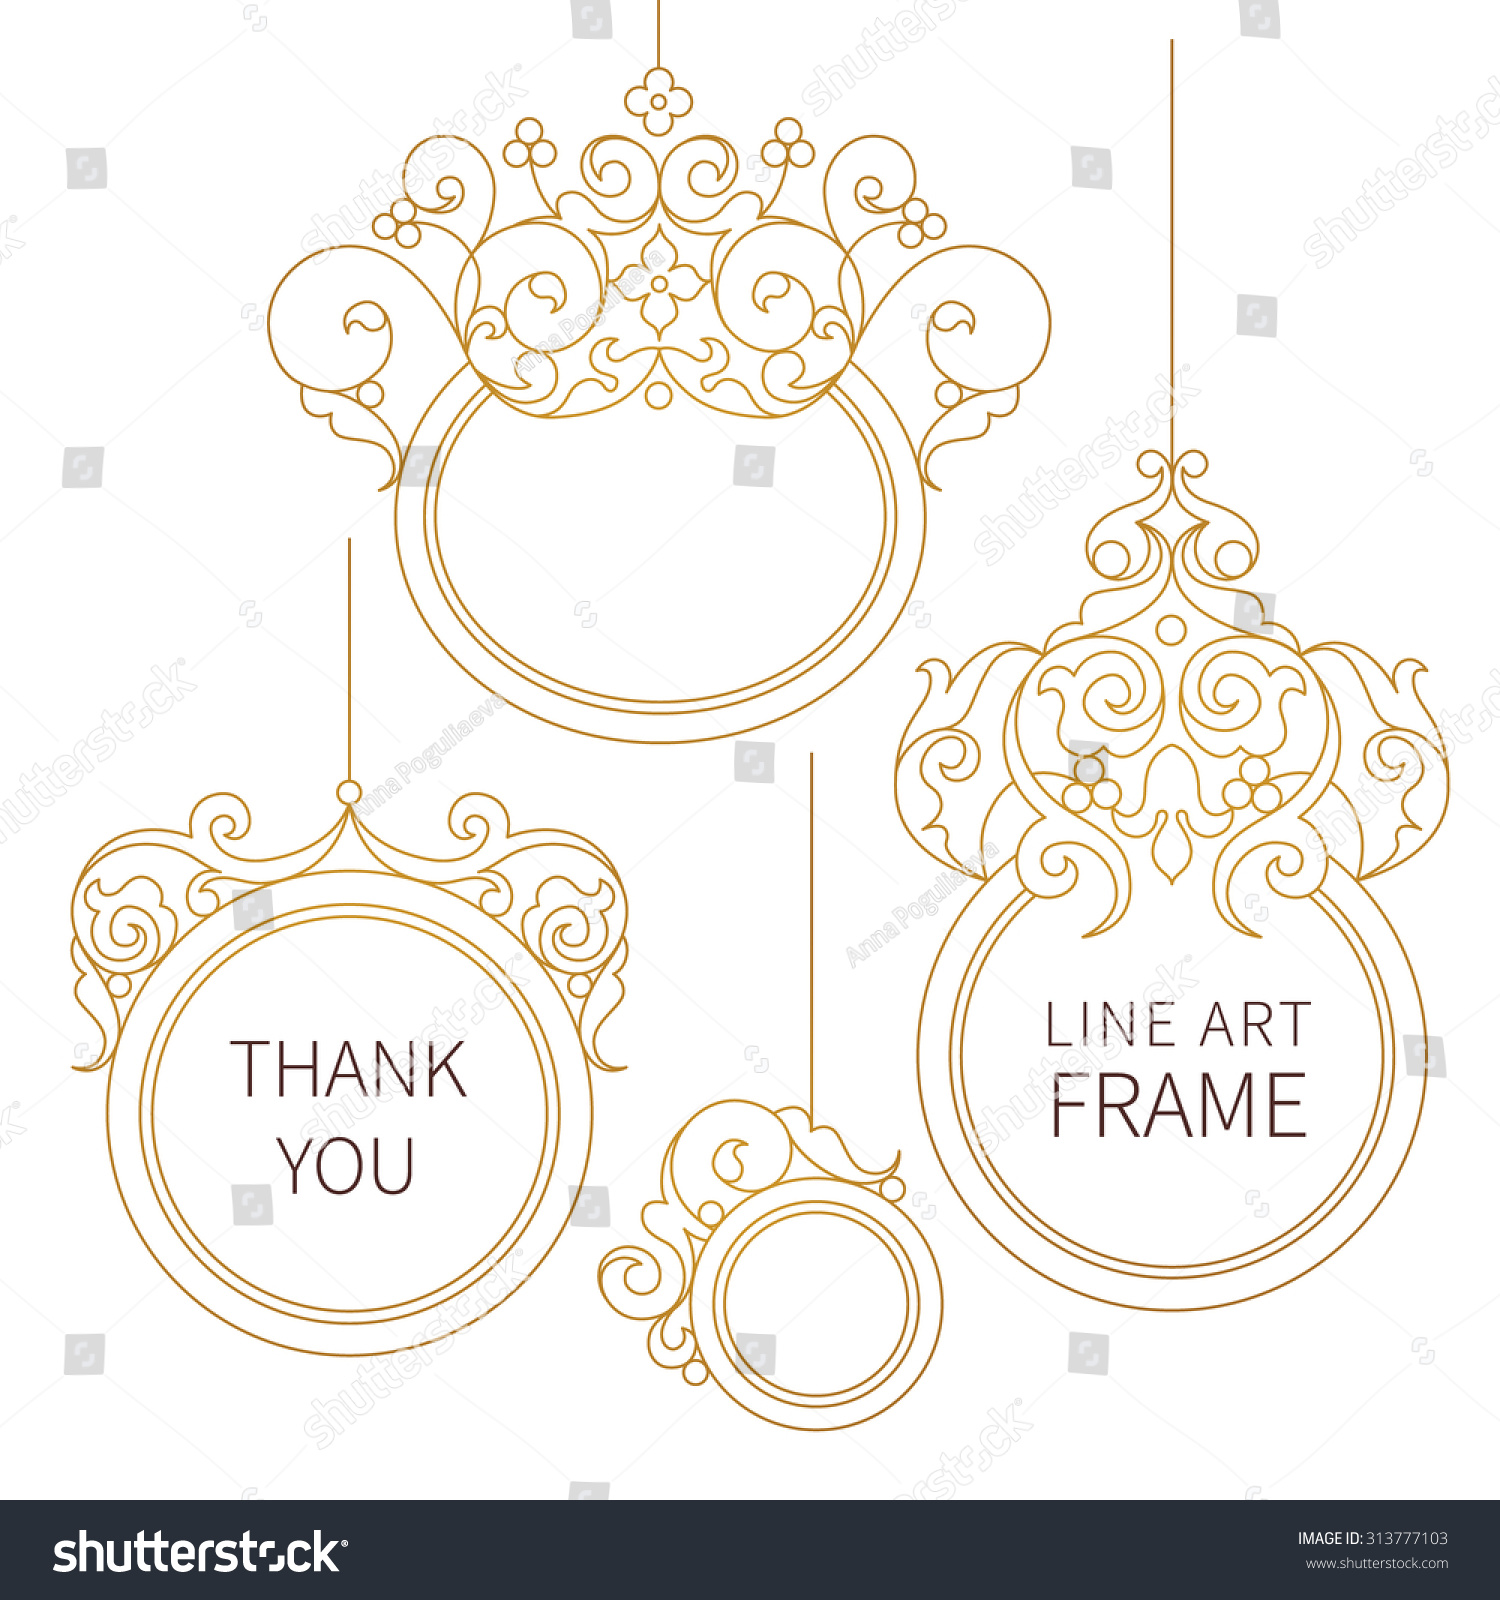 Line Art Thank You : Vector decorative line art frames design stock